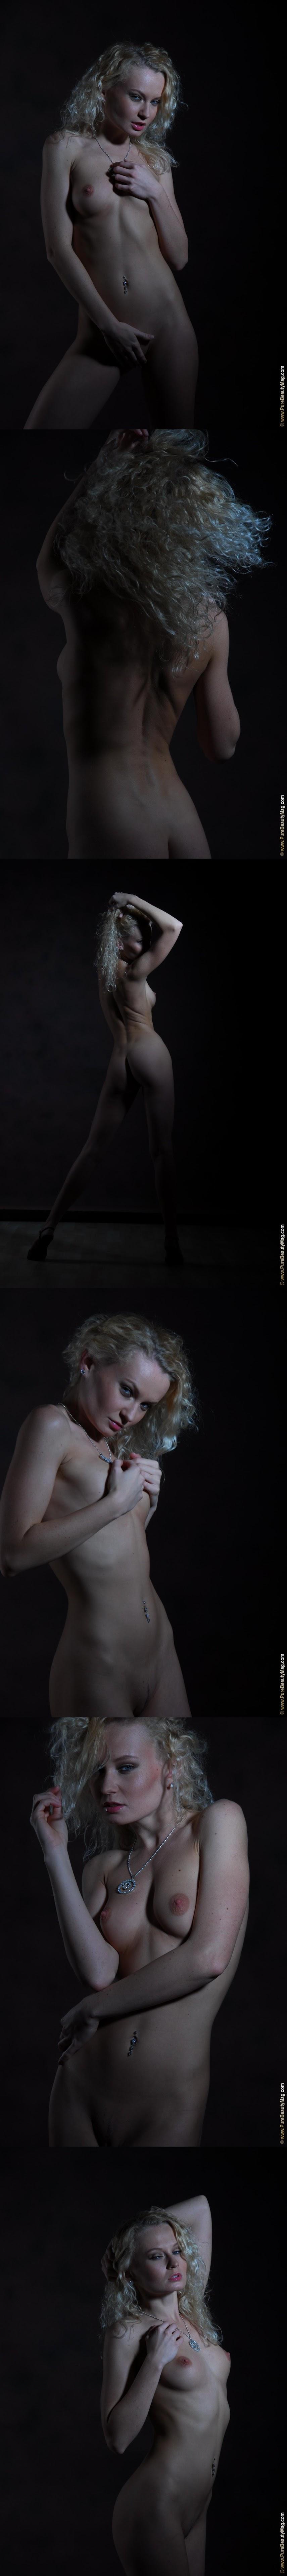 PureBeautyMag PBM  - 2007-06-17 - #s362648 - Dagmar J - Dancer in the Dark - 3872px